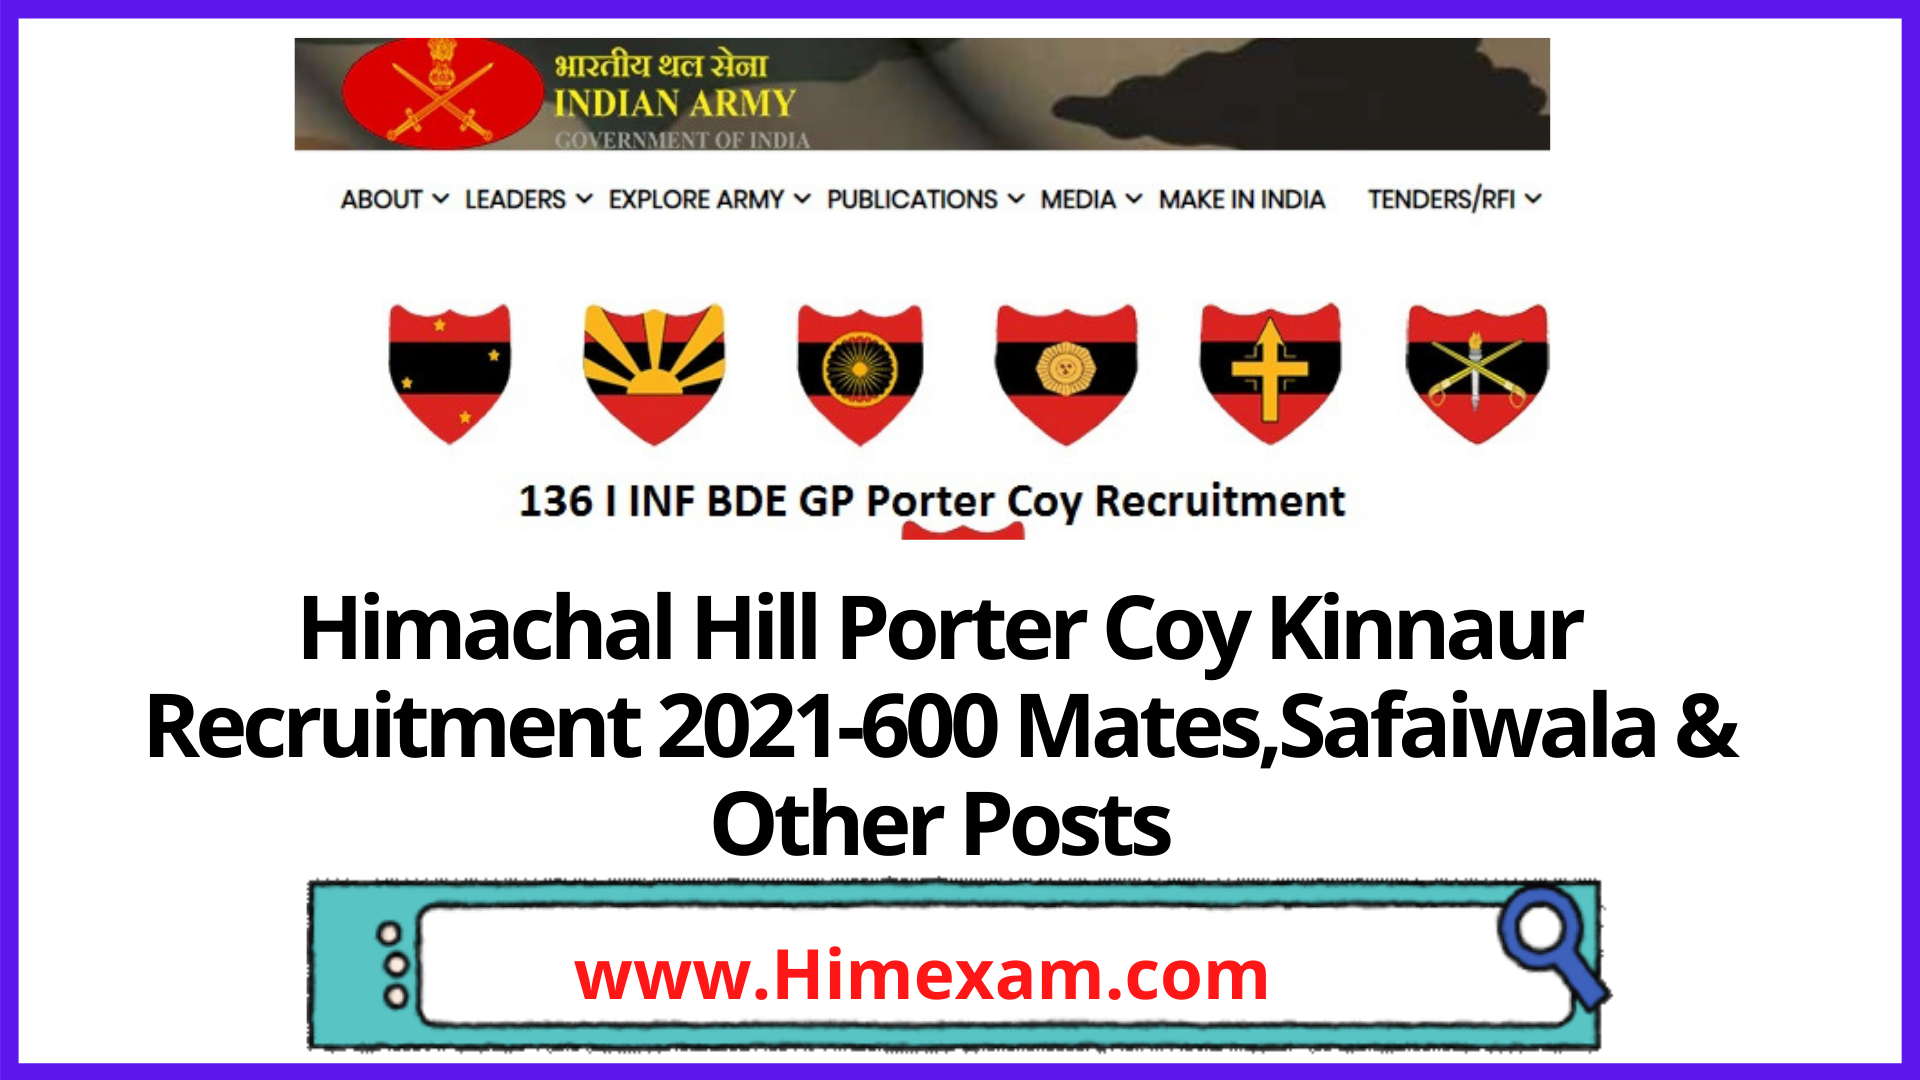 Himachal Hill Porter Coy Kinnaur  Recruitment 2021-600 Mates,Safaiwala & Other Posts